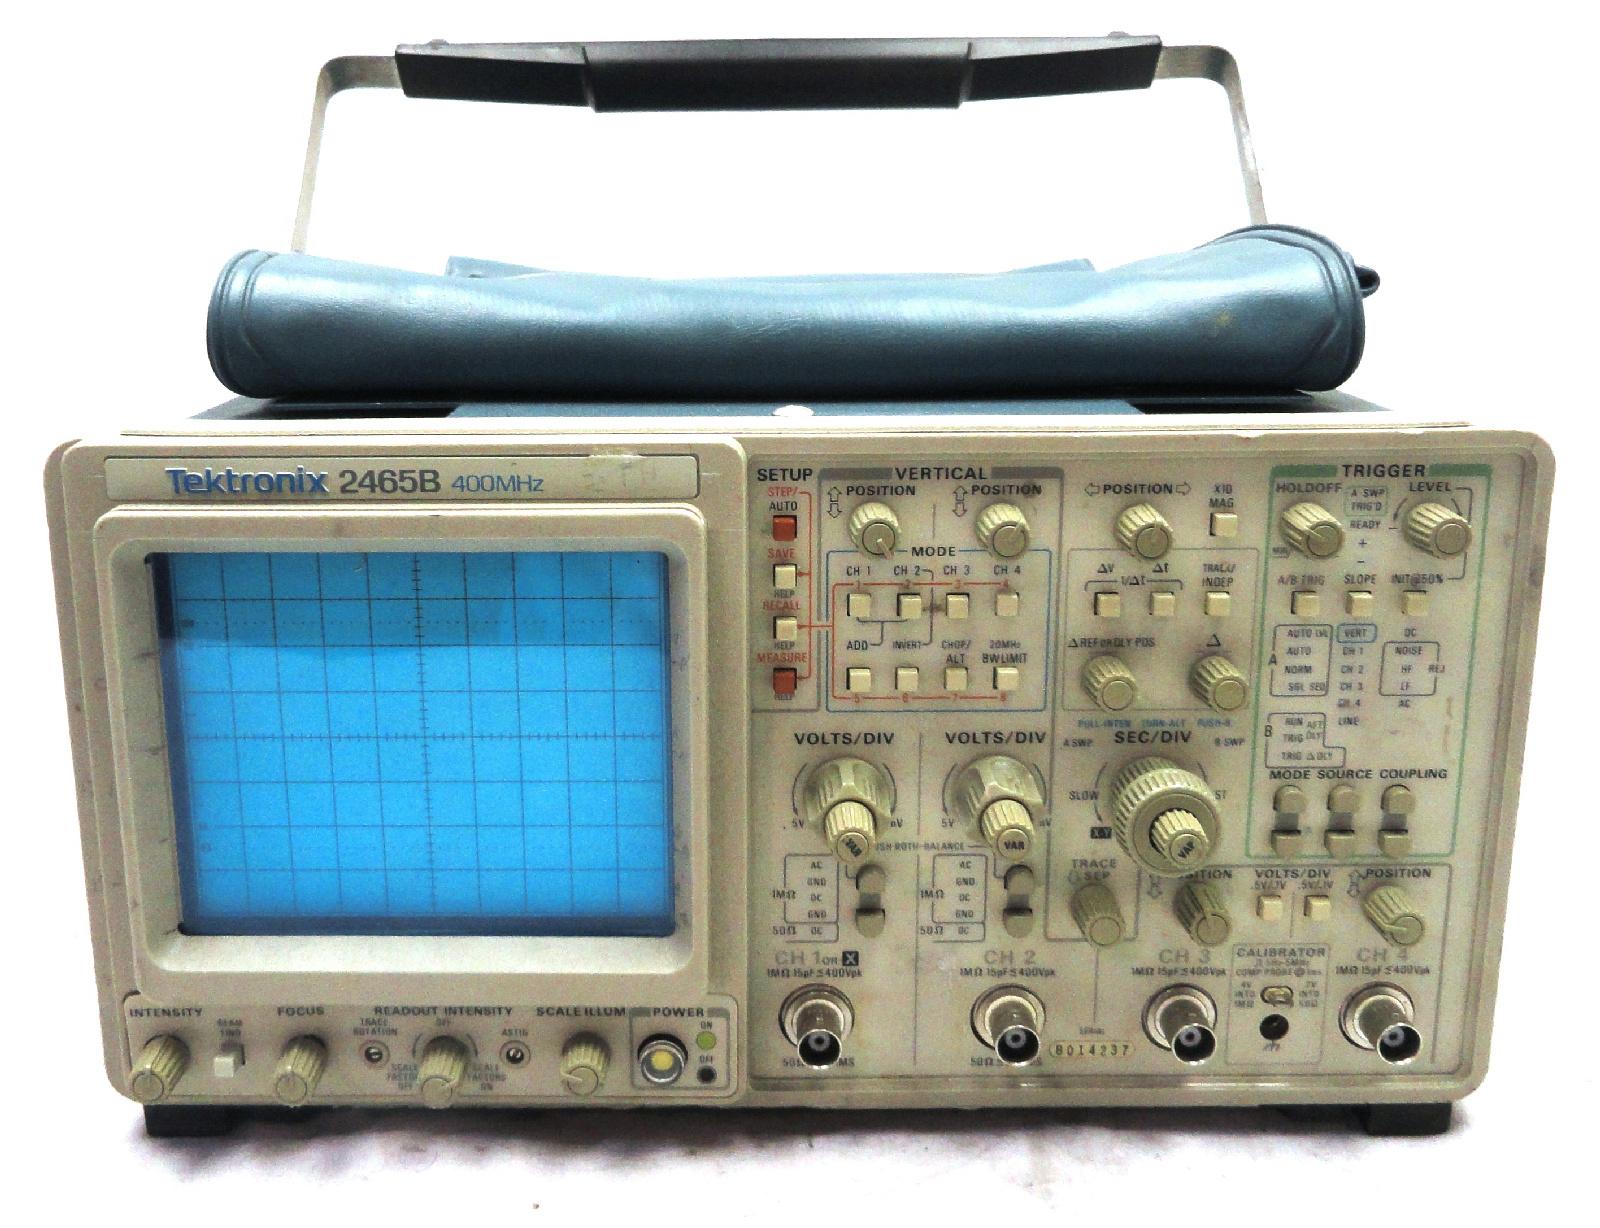 Tektronix Analog Oscilloscope : Tektronix b mhz analog oscilloscope ebay